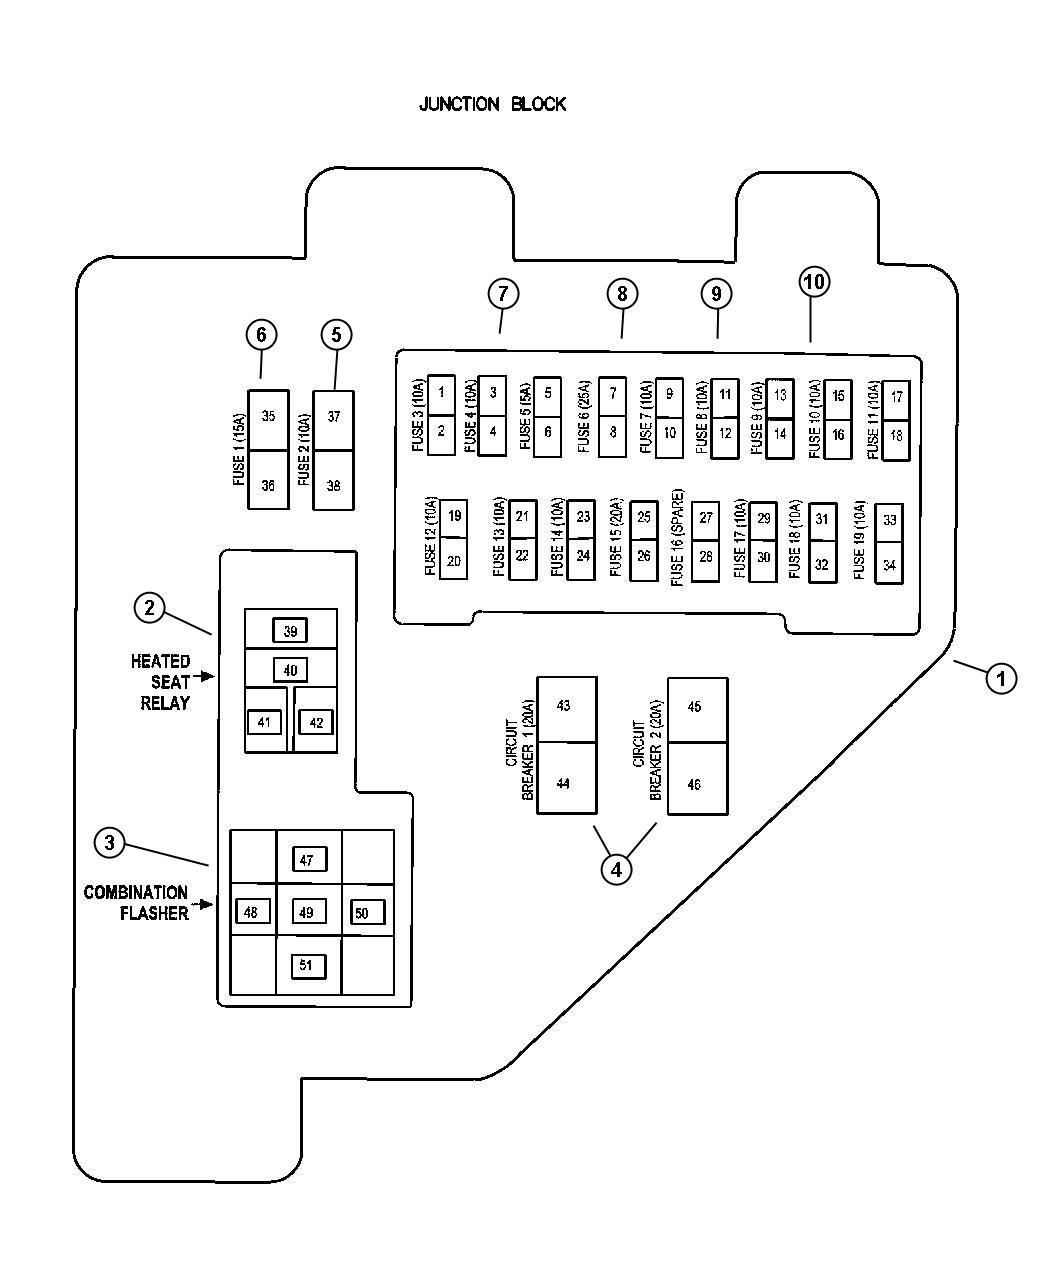 1999 Dodge Ram Fuse Box Diagram Turn - Wiring Diagram Data - 99 Dodge Ram Headlight Wiring Diagram